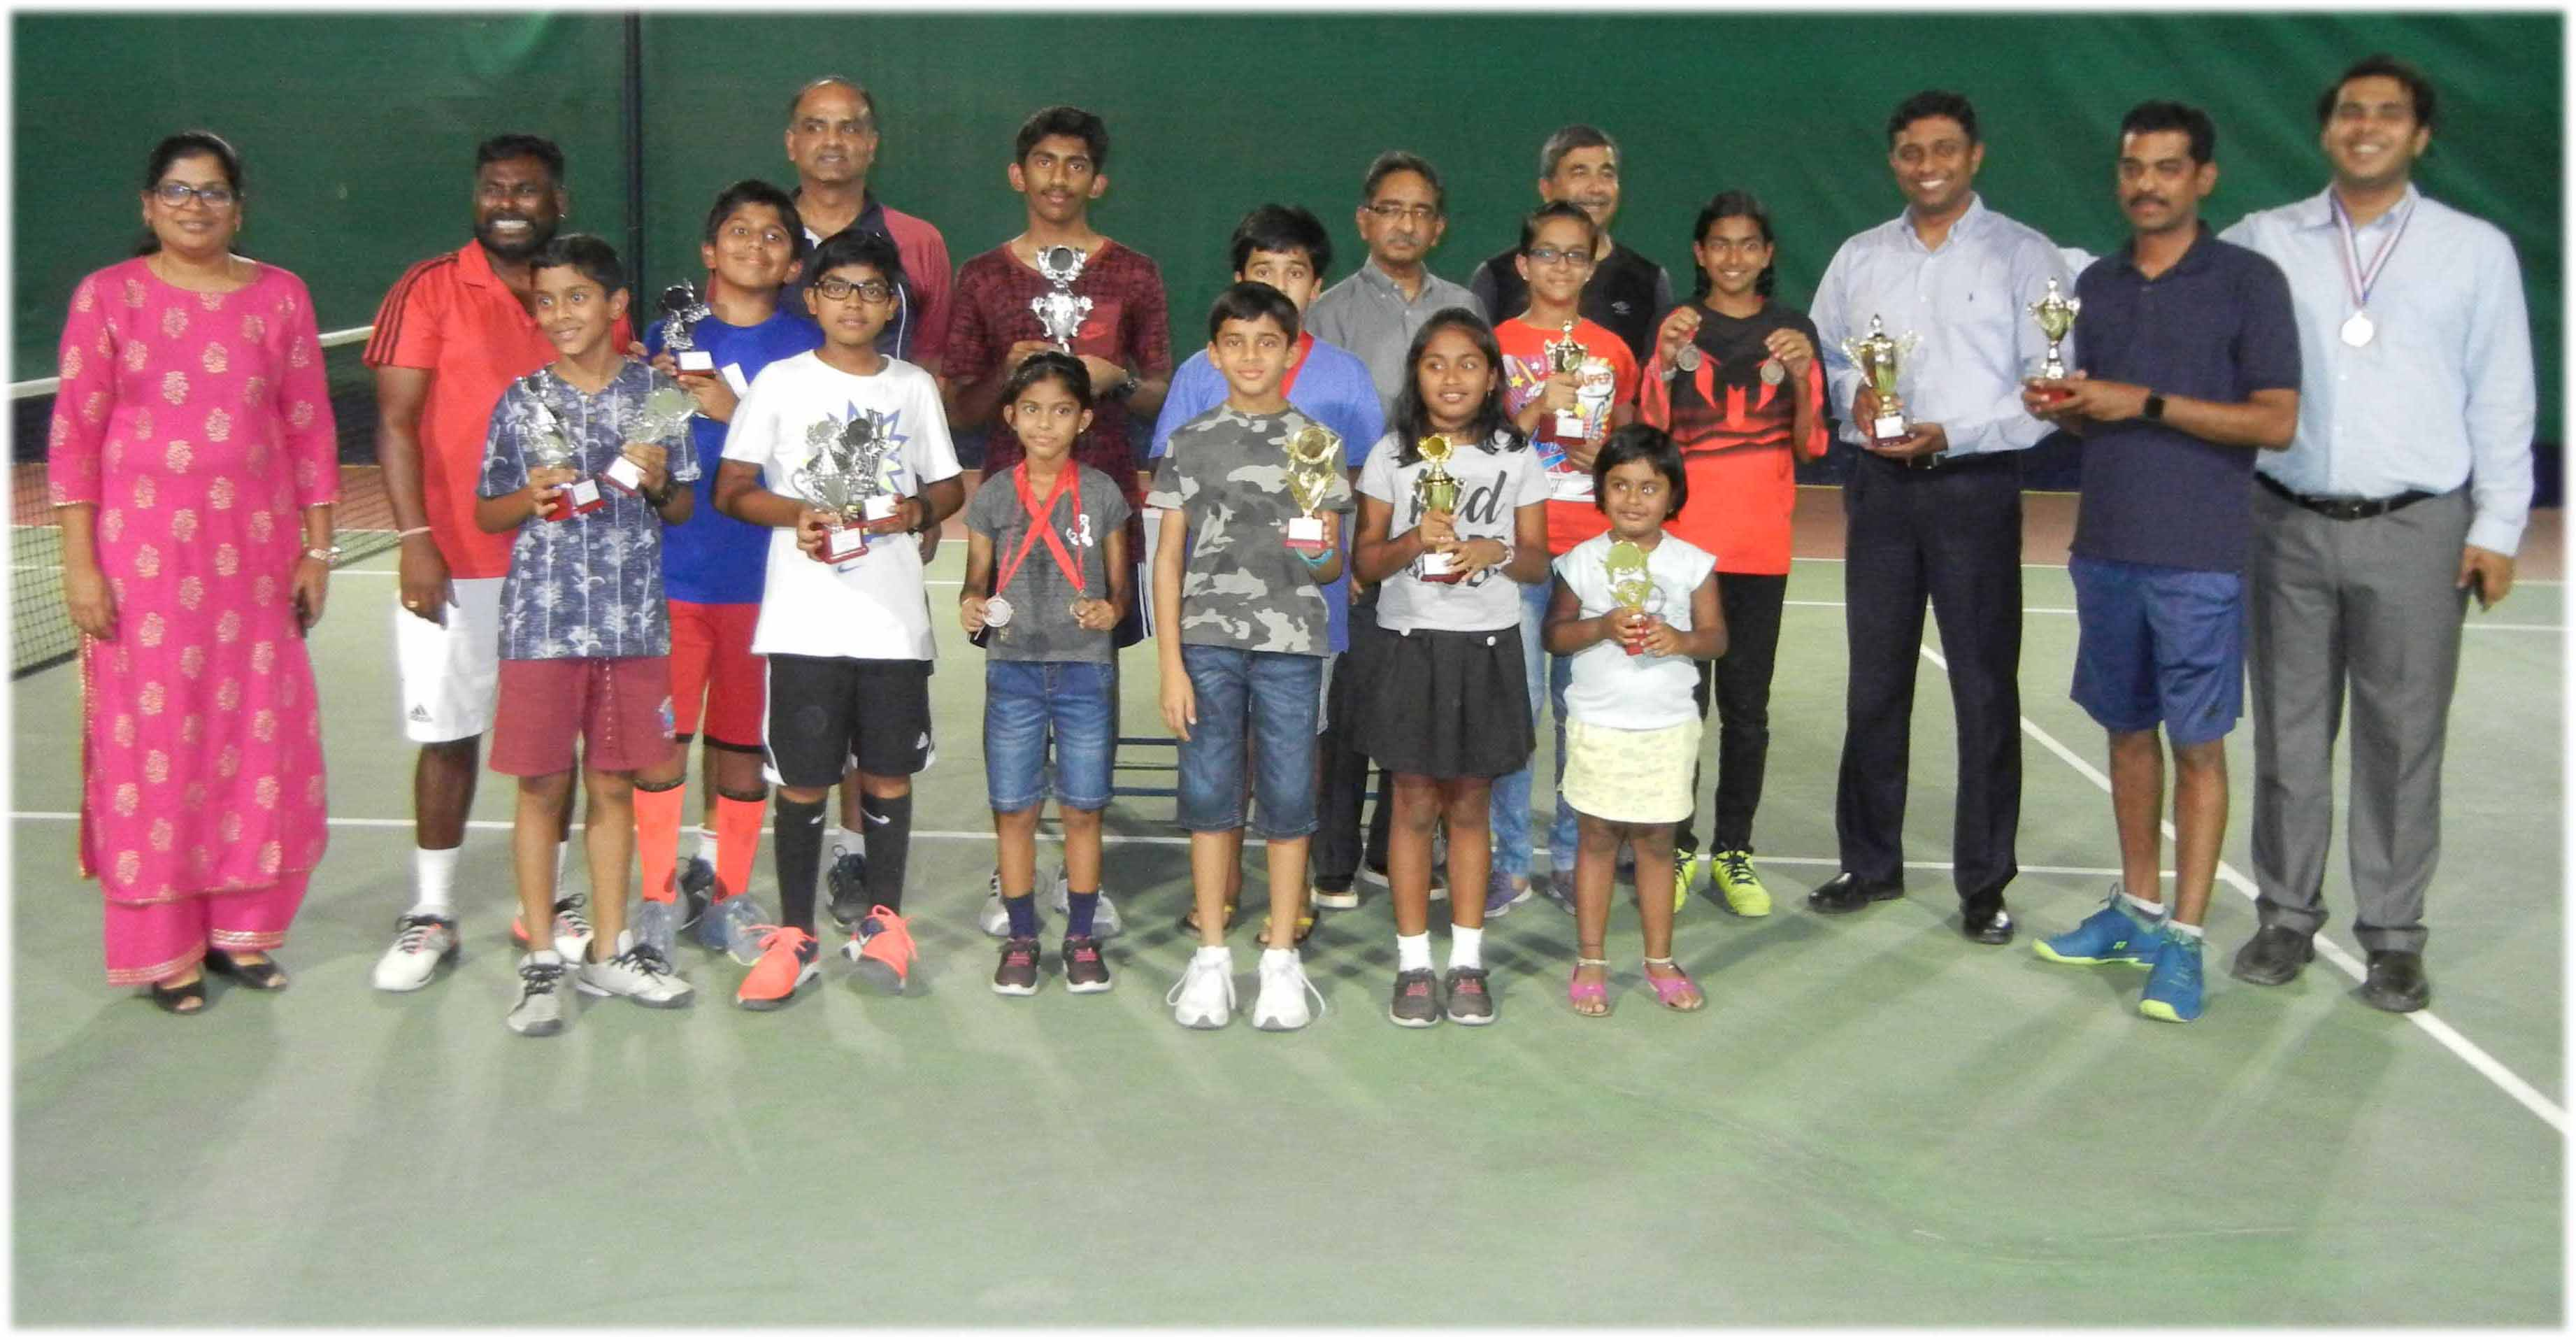 Shanawaz, Achyut, Praneet win tennis titles